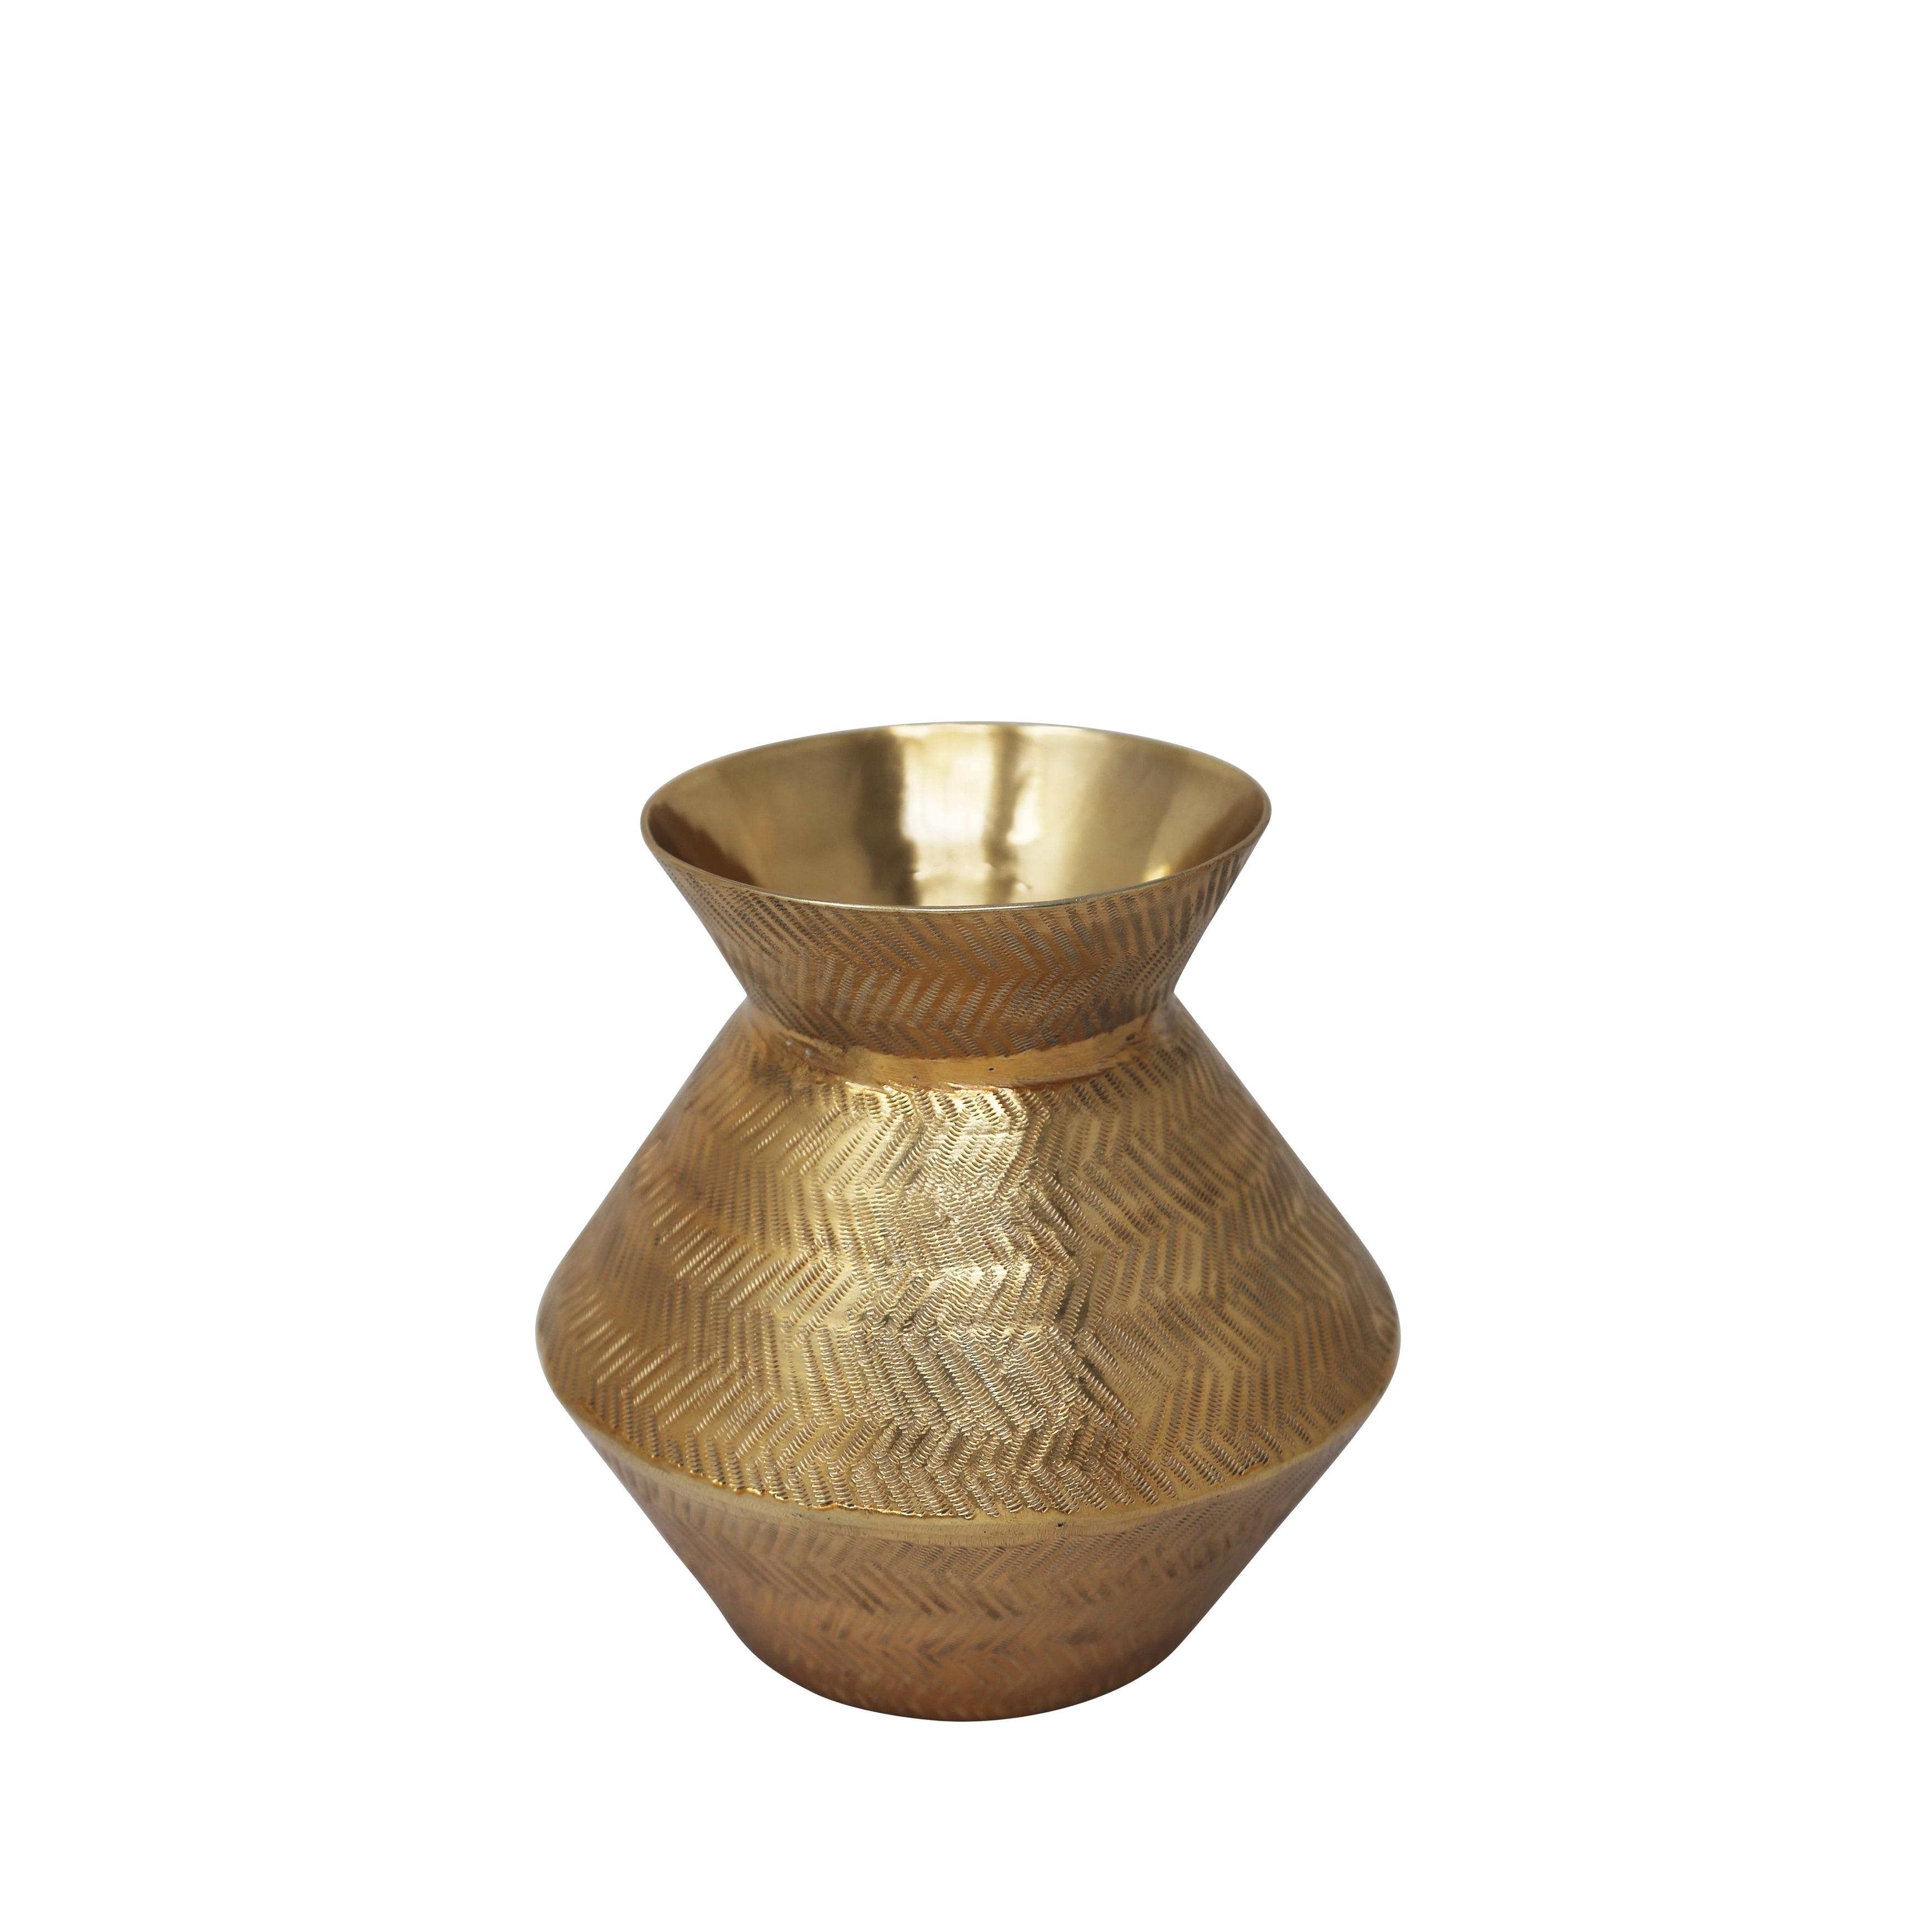 Aluminium Vase with Textured Details, Small, Gold